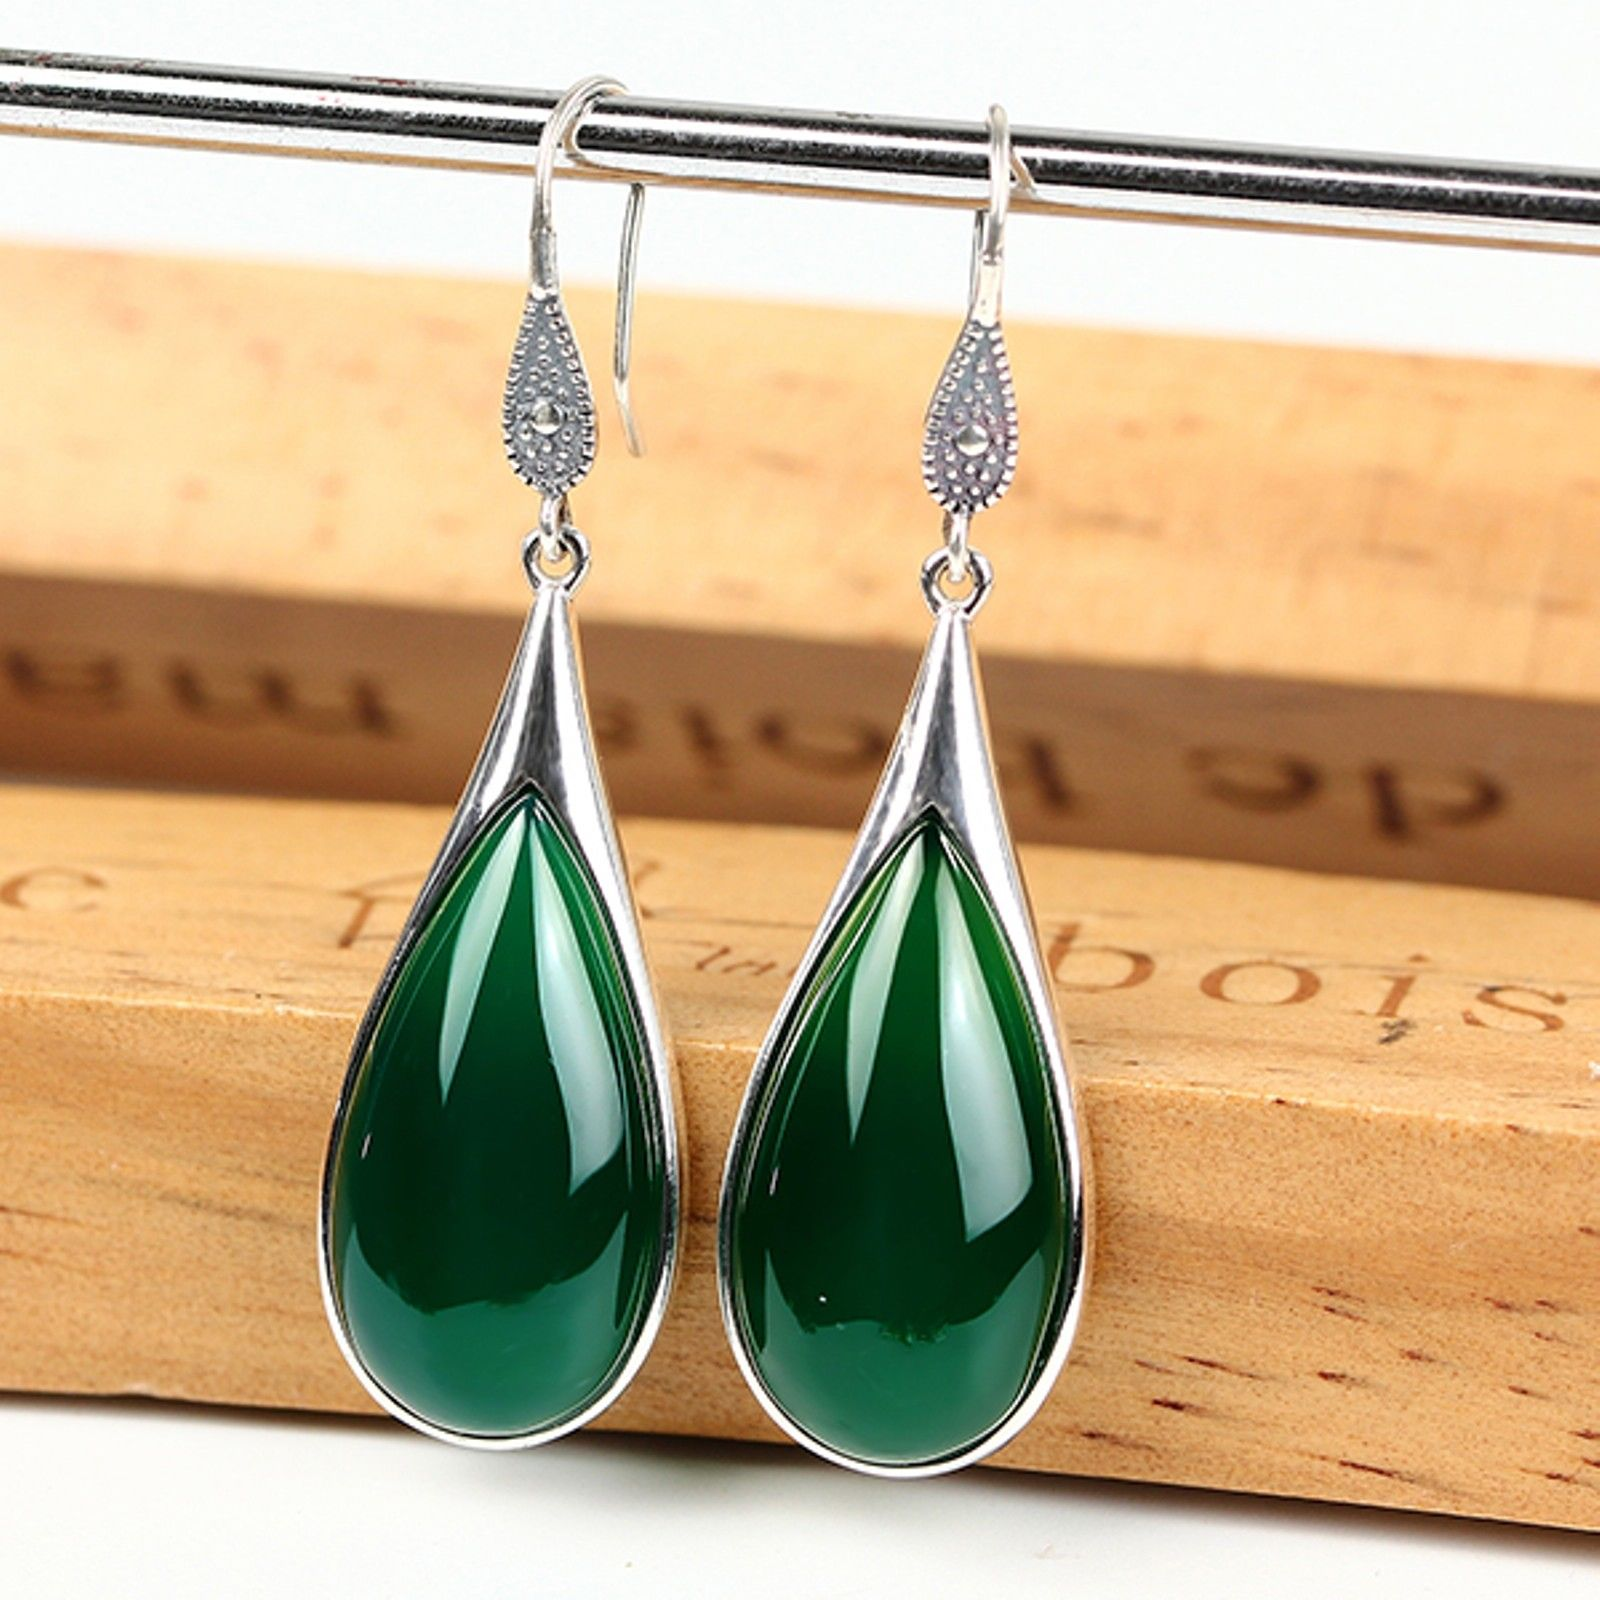 New Vintage Sterling S925 Silver Green Agate Lucky Drop Dangle Earrings